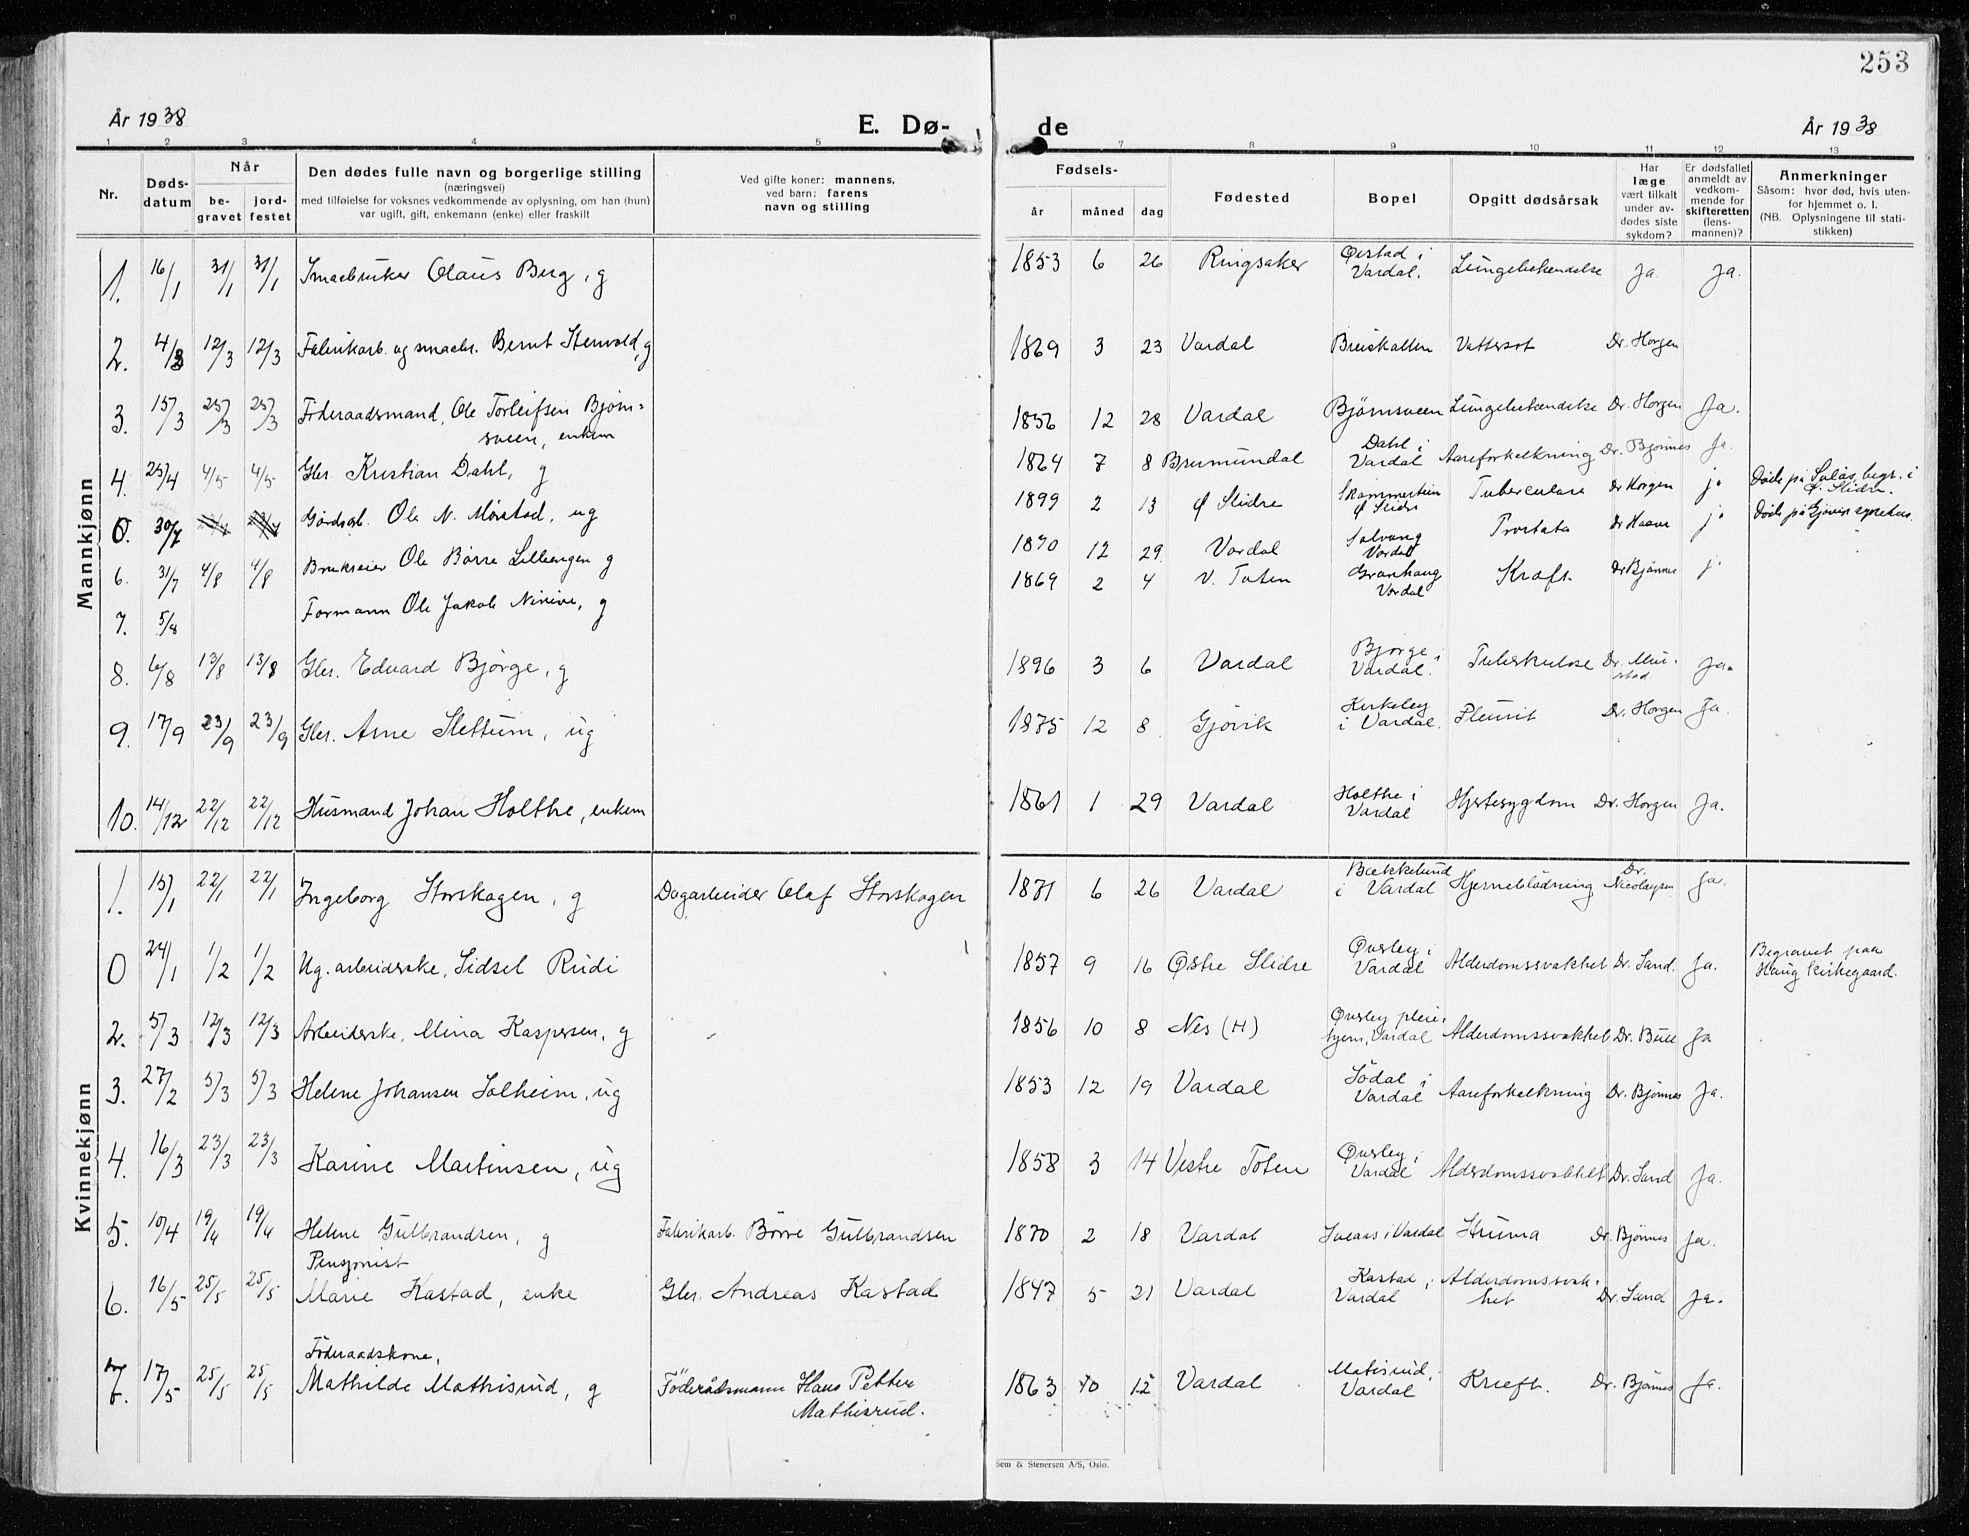 SAH, Vardal prestekontor, H/Ha/Haa/L0018: Ministerialbok nr. 18, 1930-1945, s. 253